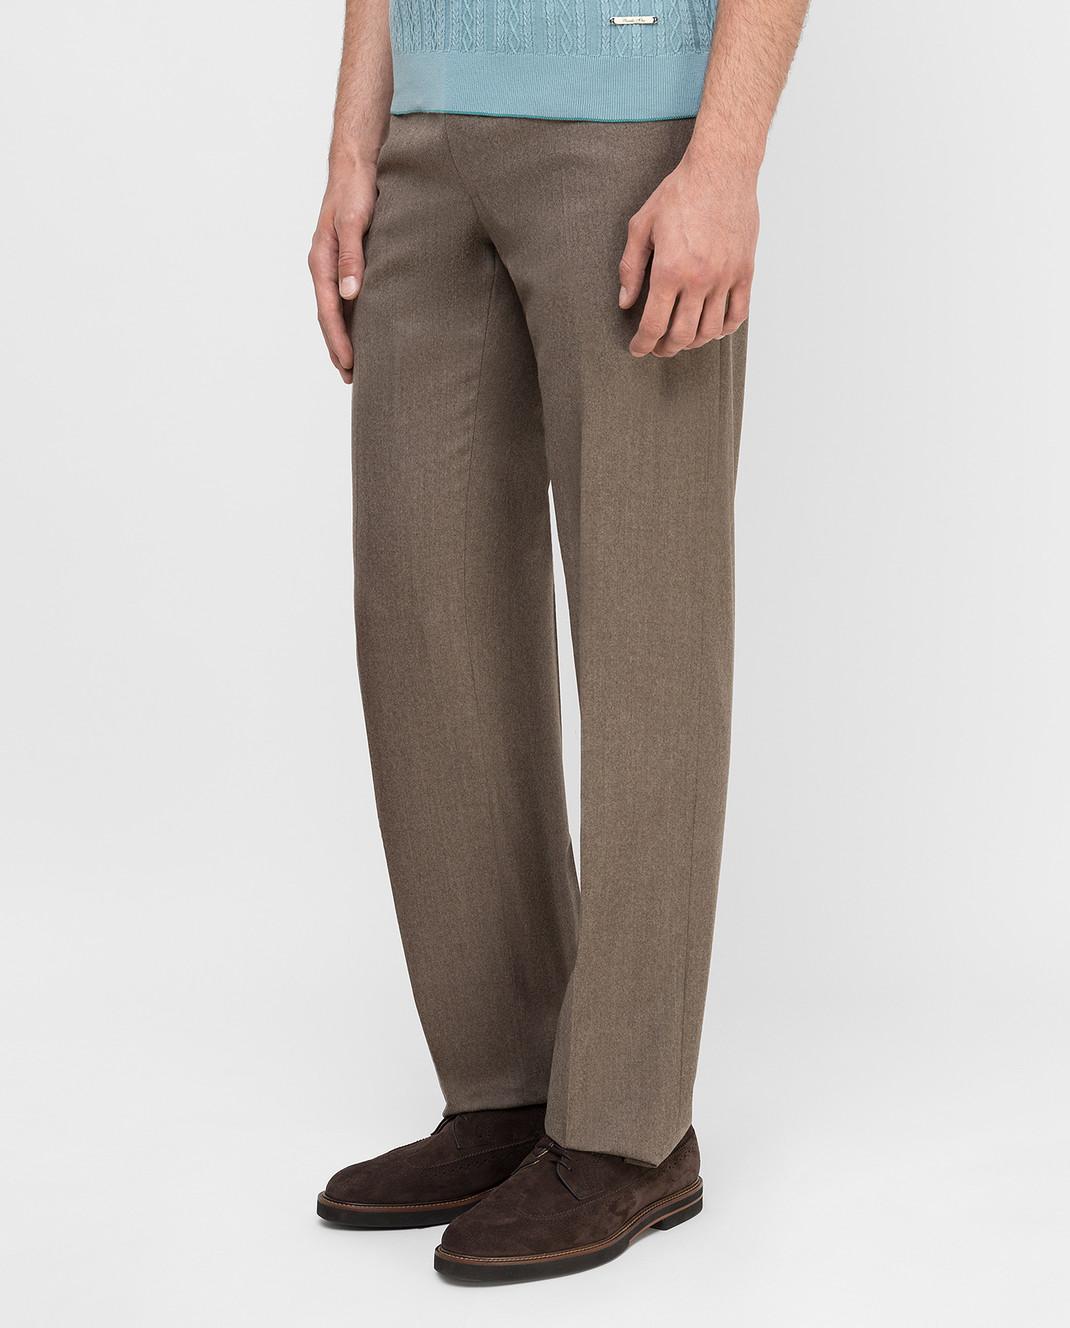 Castello d'Oro Бежевые брюки из шерсти изображение 3